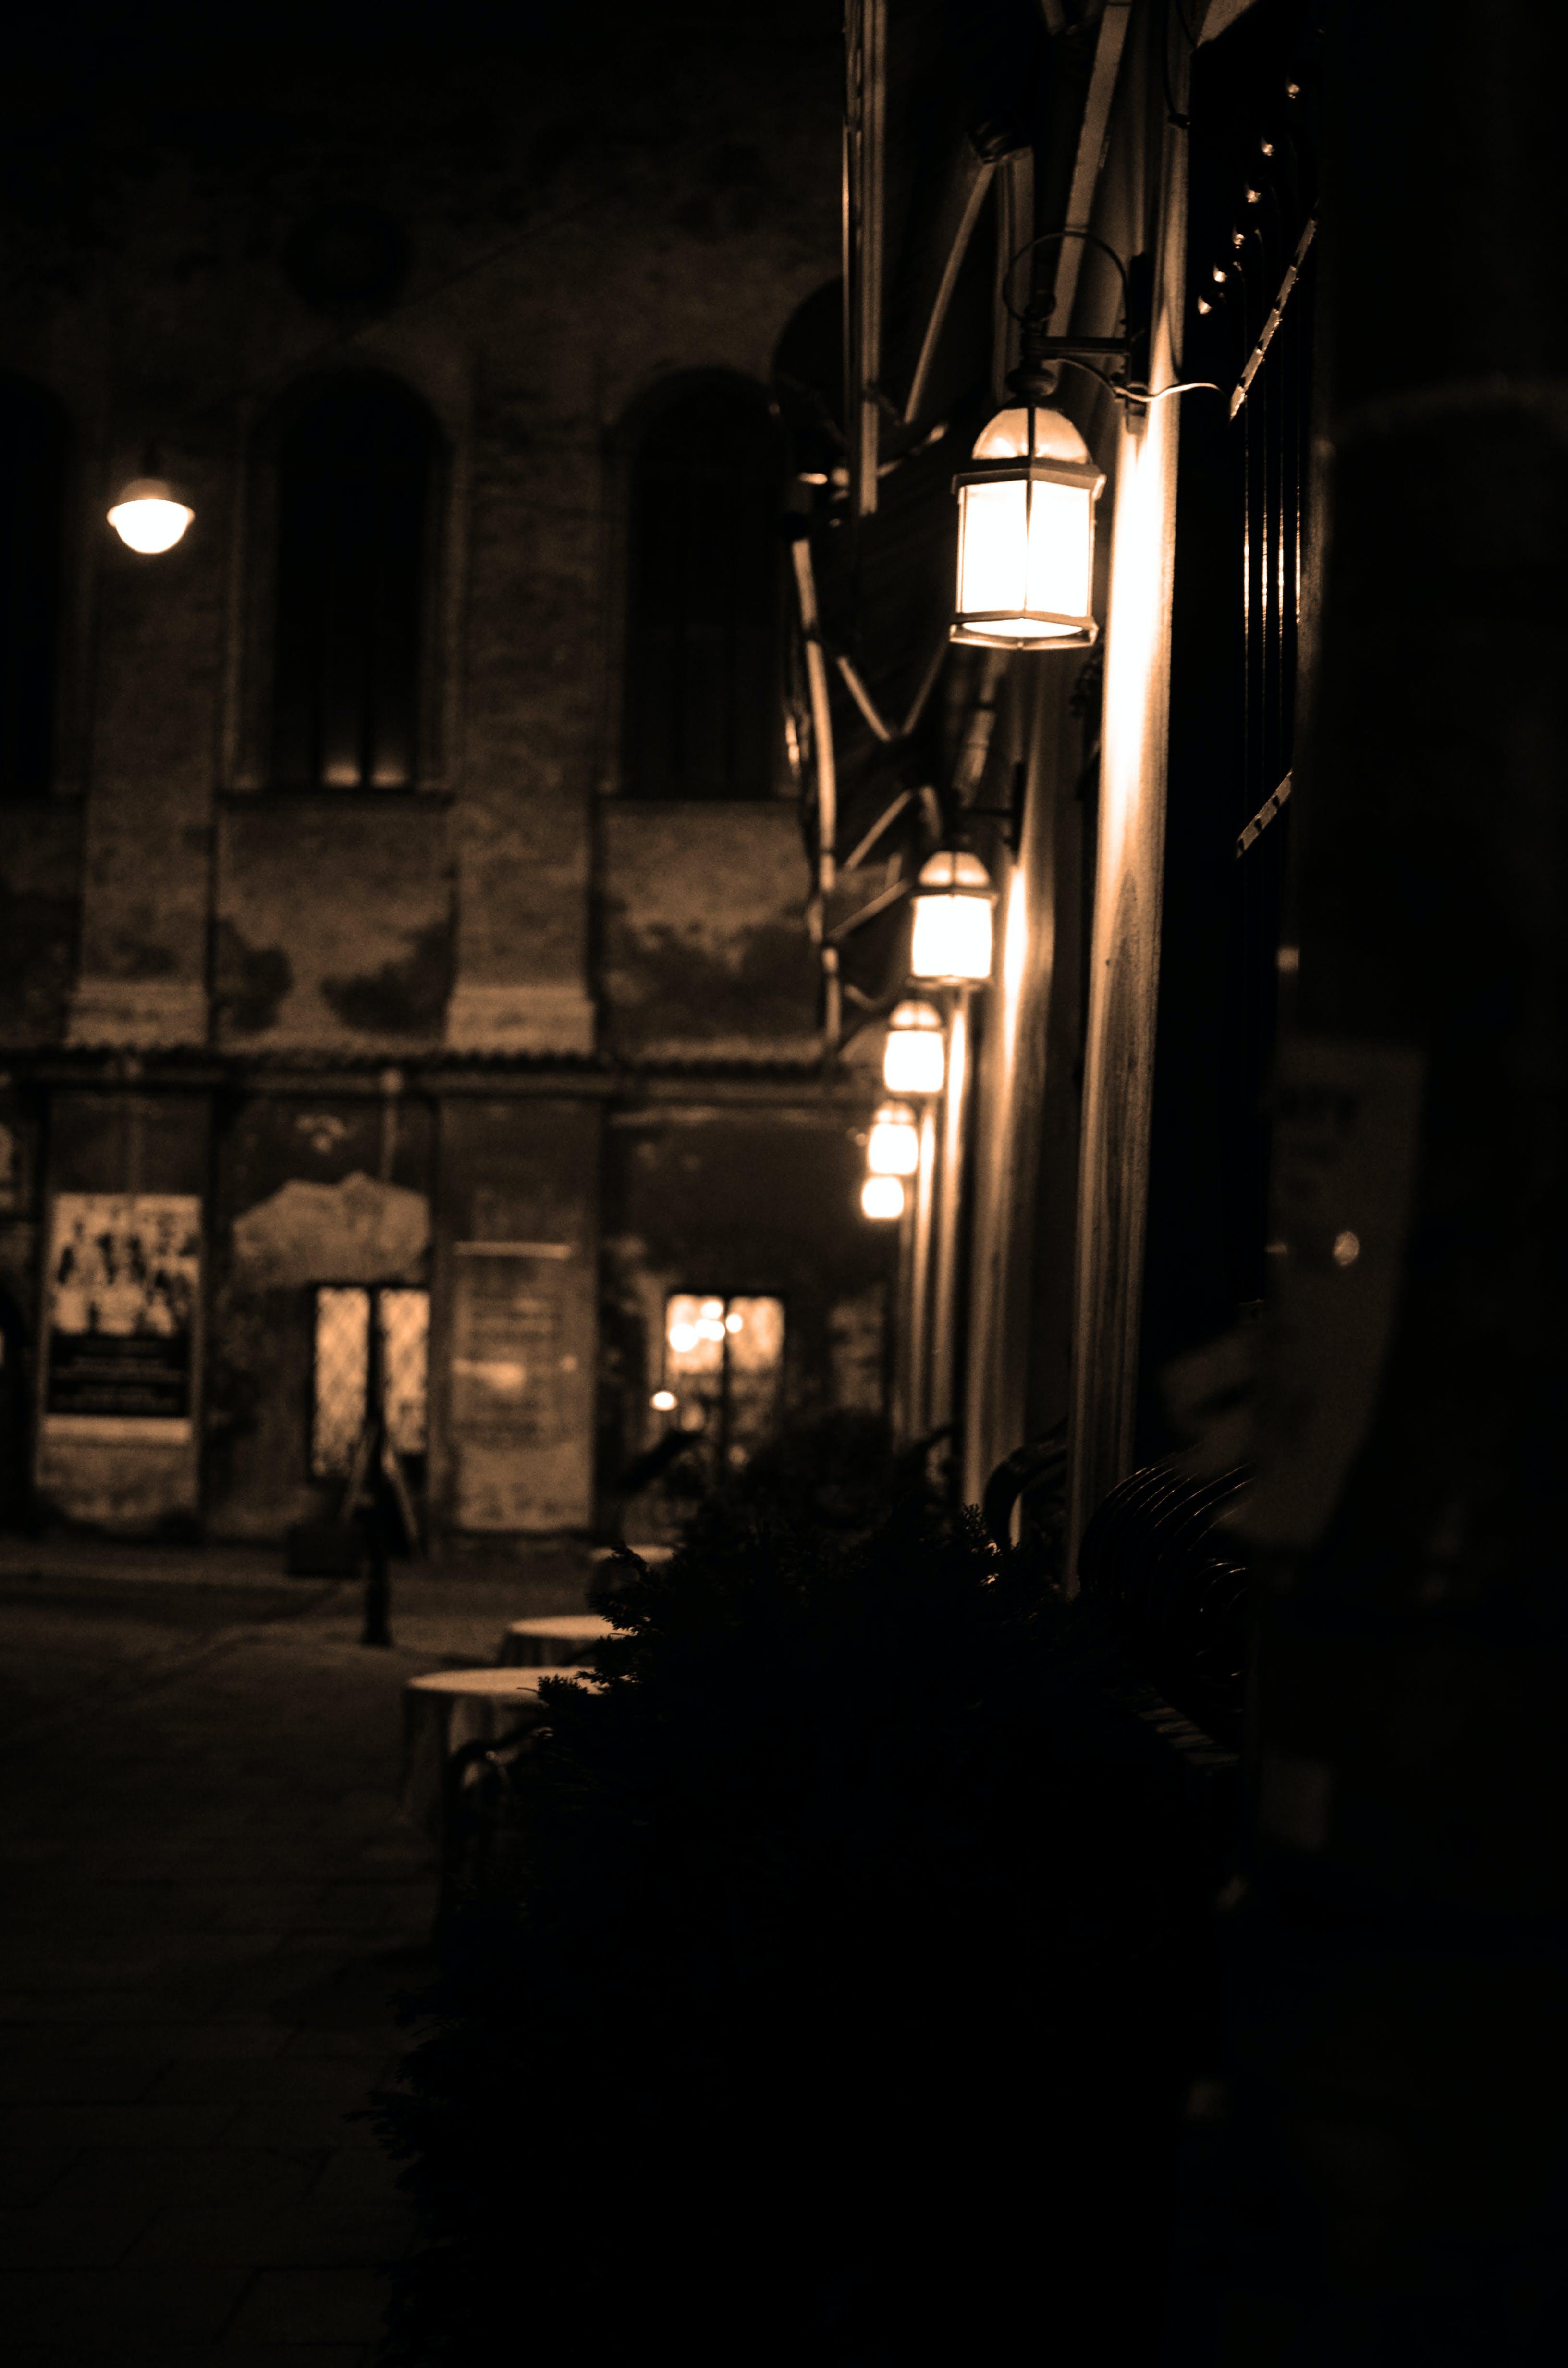 black-and-white, dark, lights